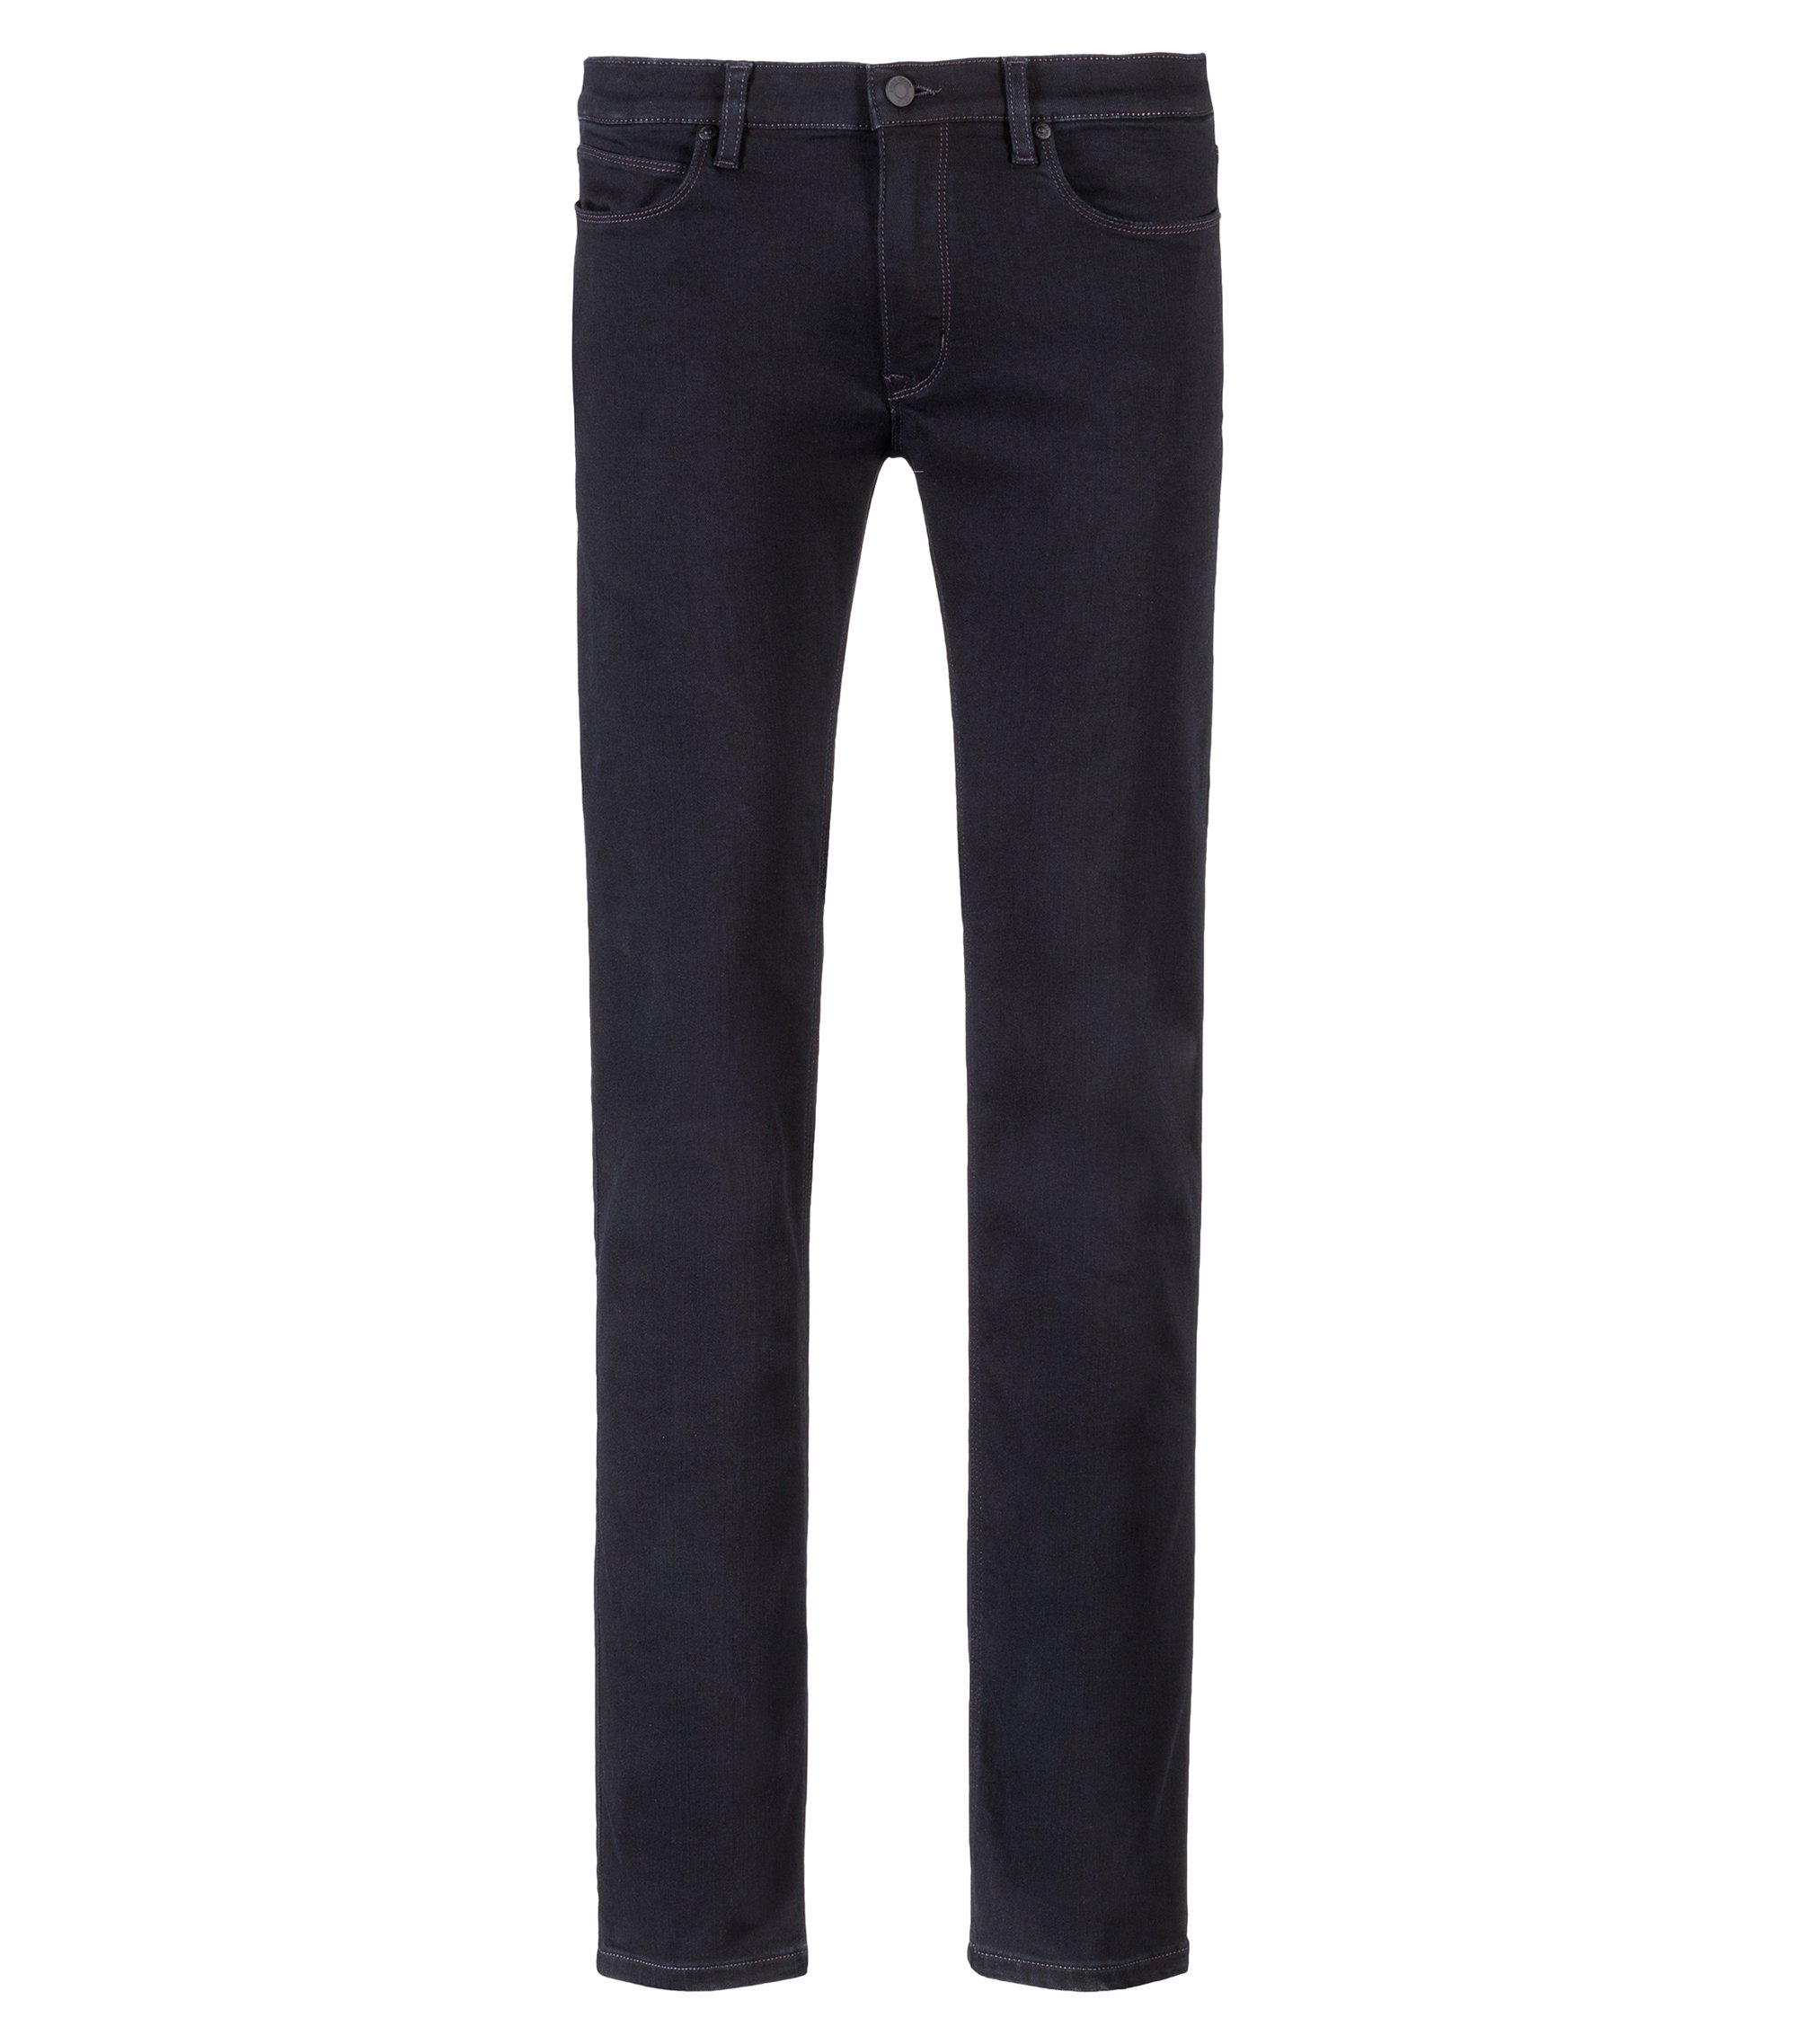 Slim-fit jeans in black stretch denim, Black